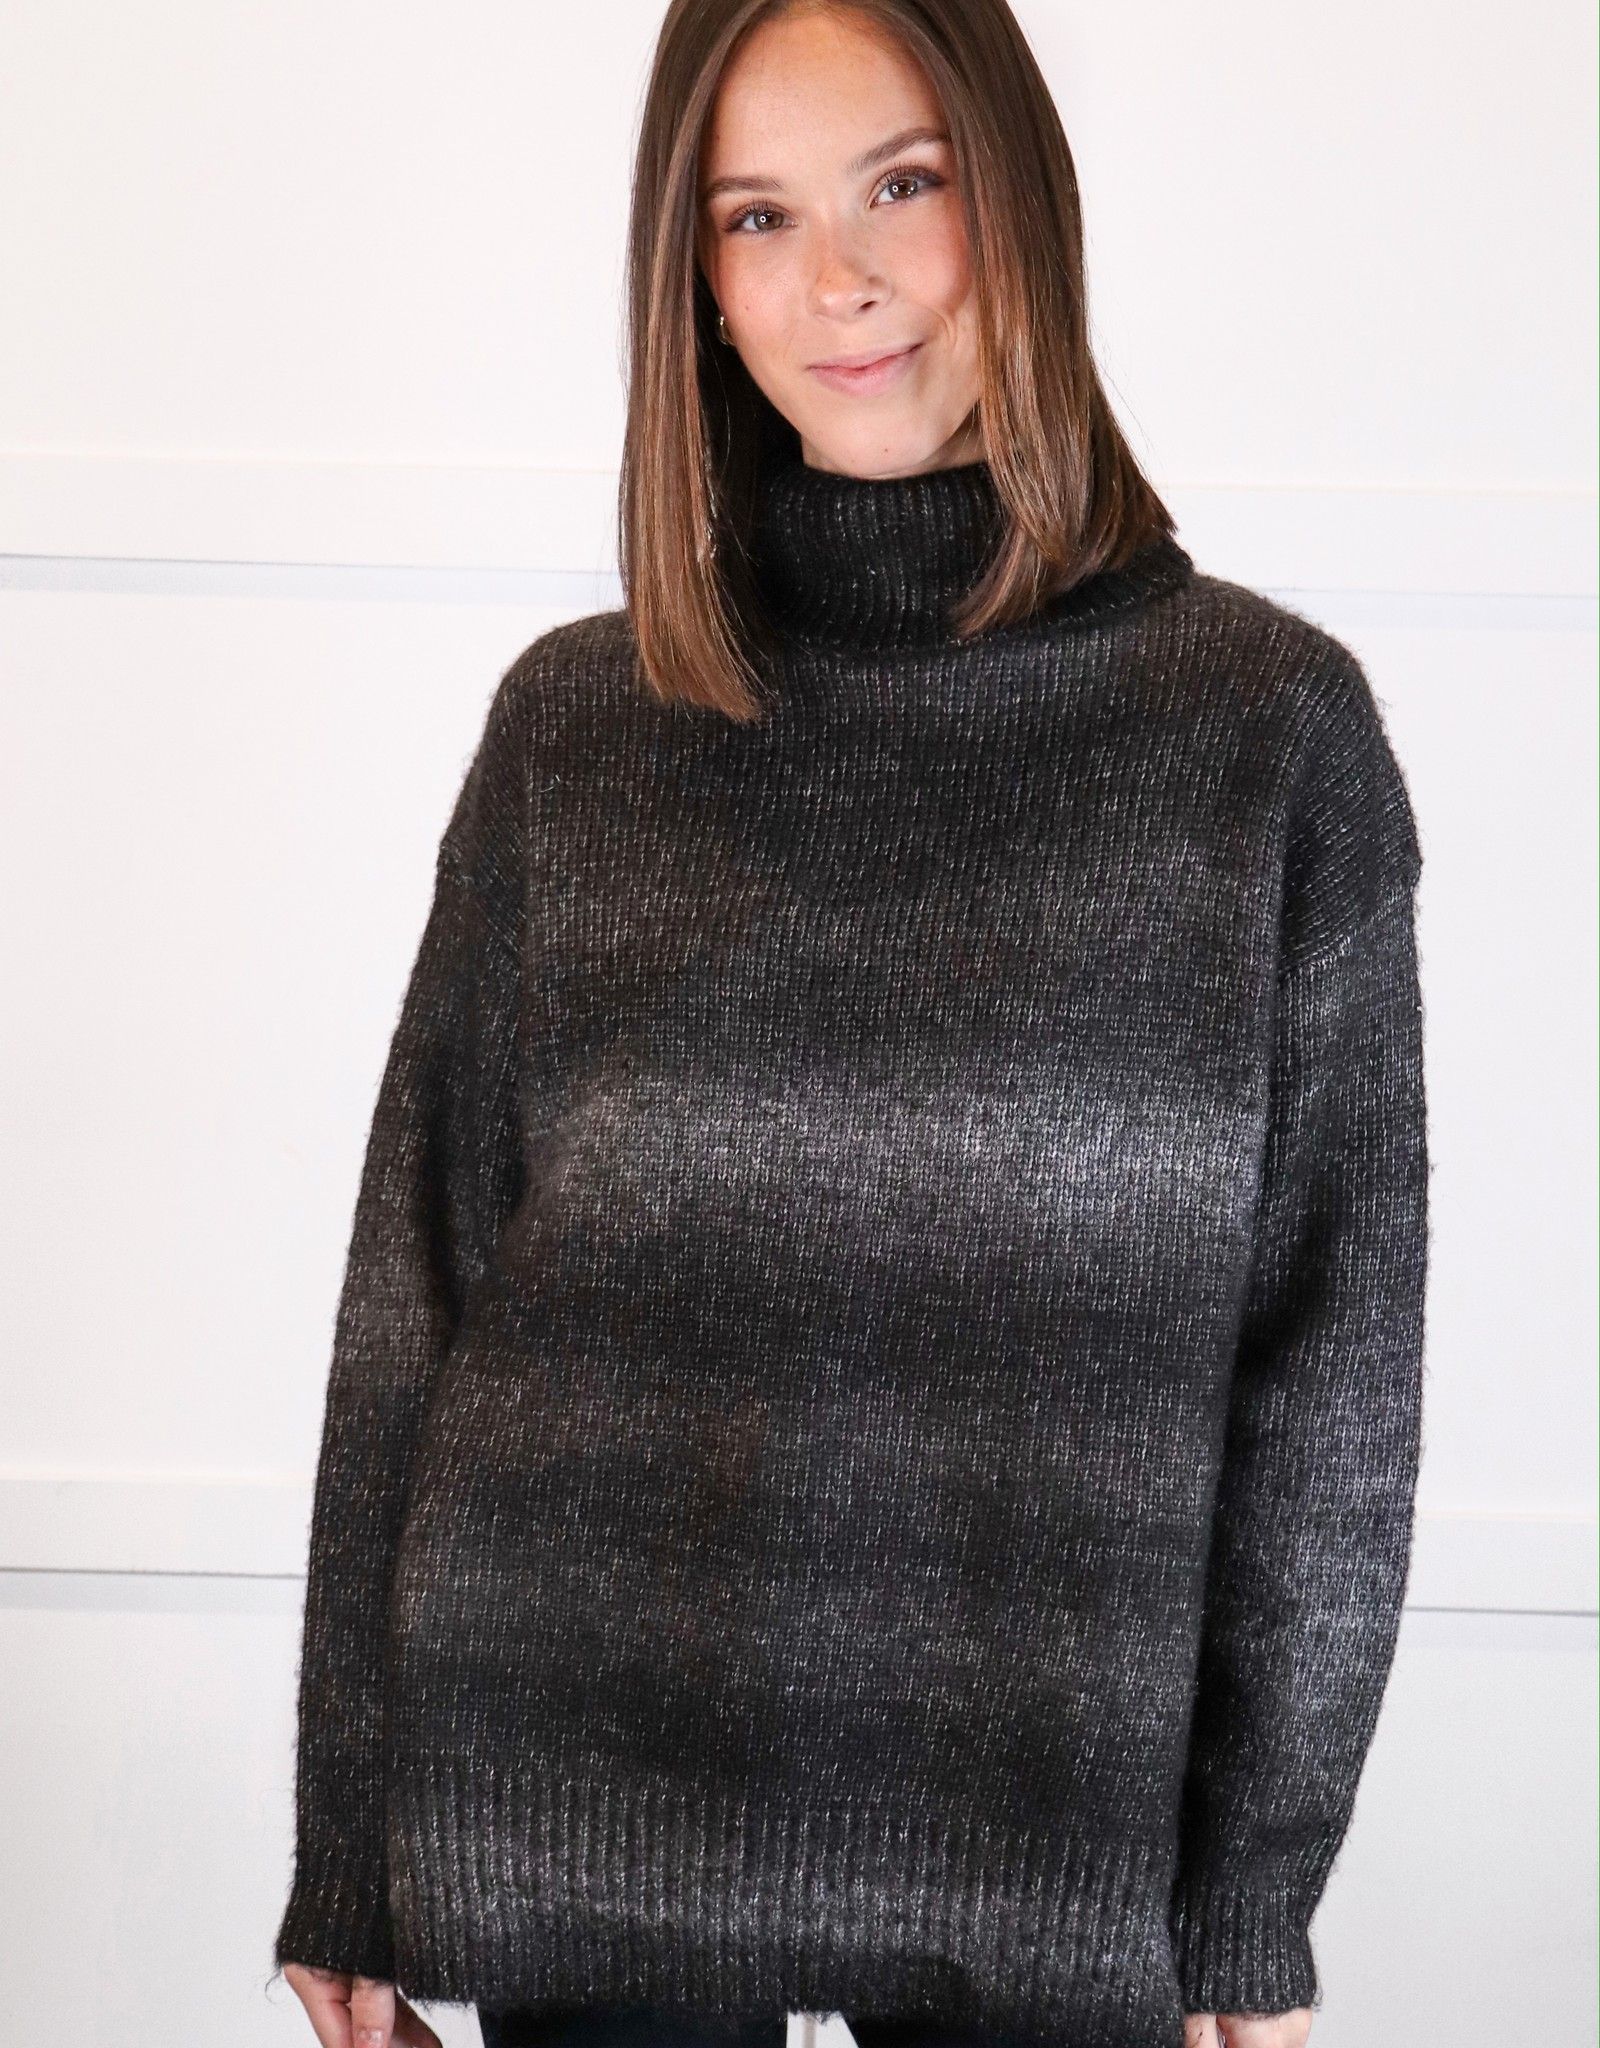 HUSH Turtle neck ombre sweater